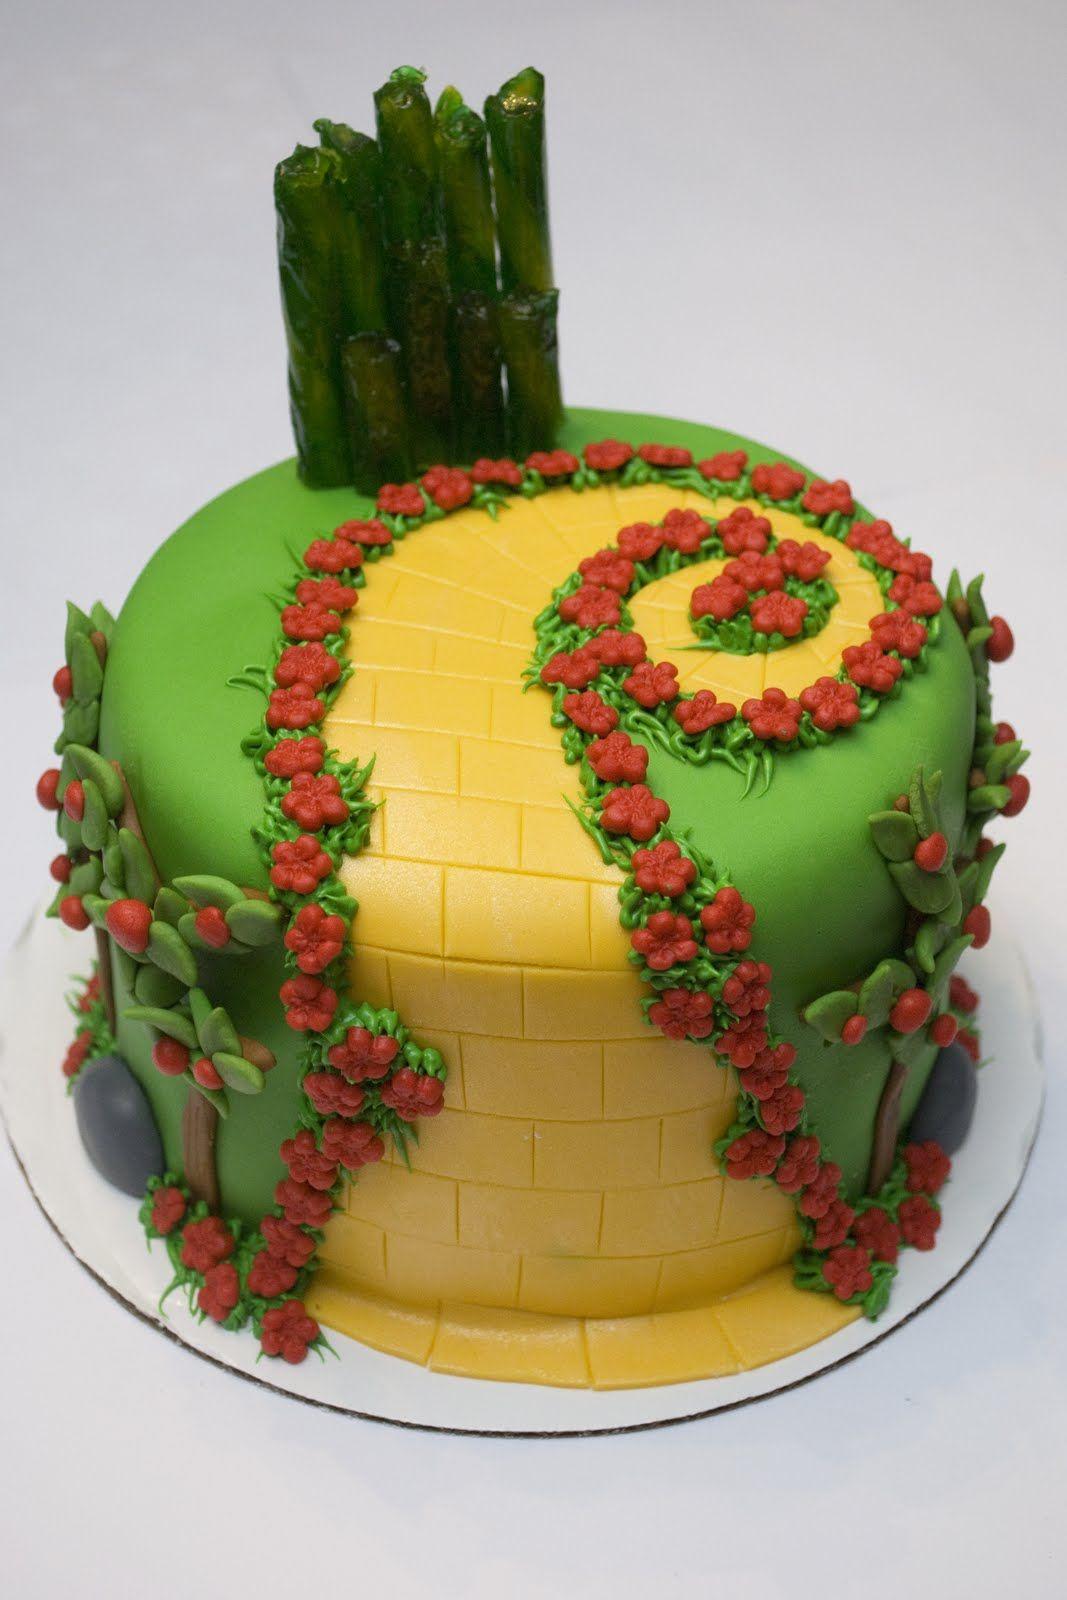 wizard of oz cake | Wizard of Oz Party | Pinterest | Cake, Jolly ...